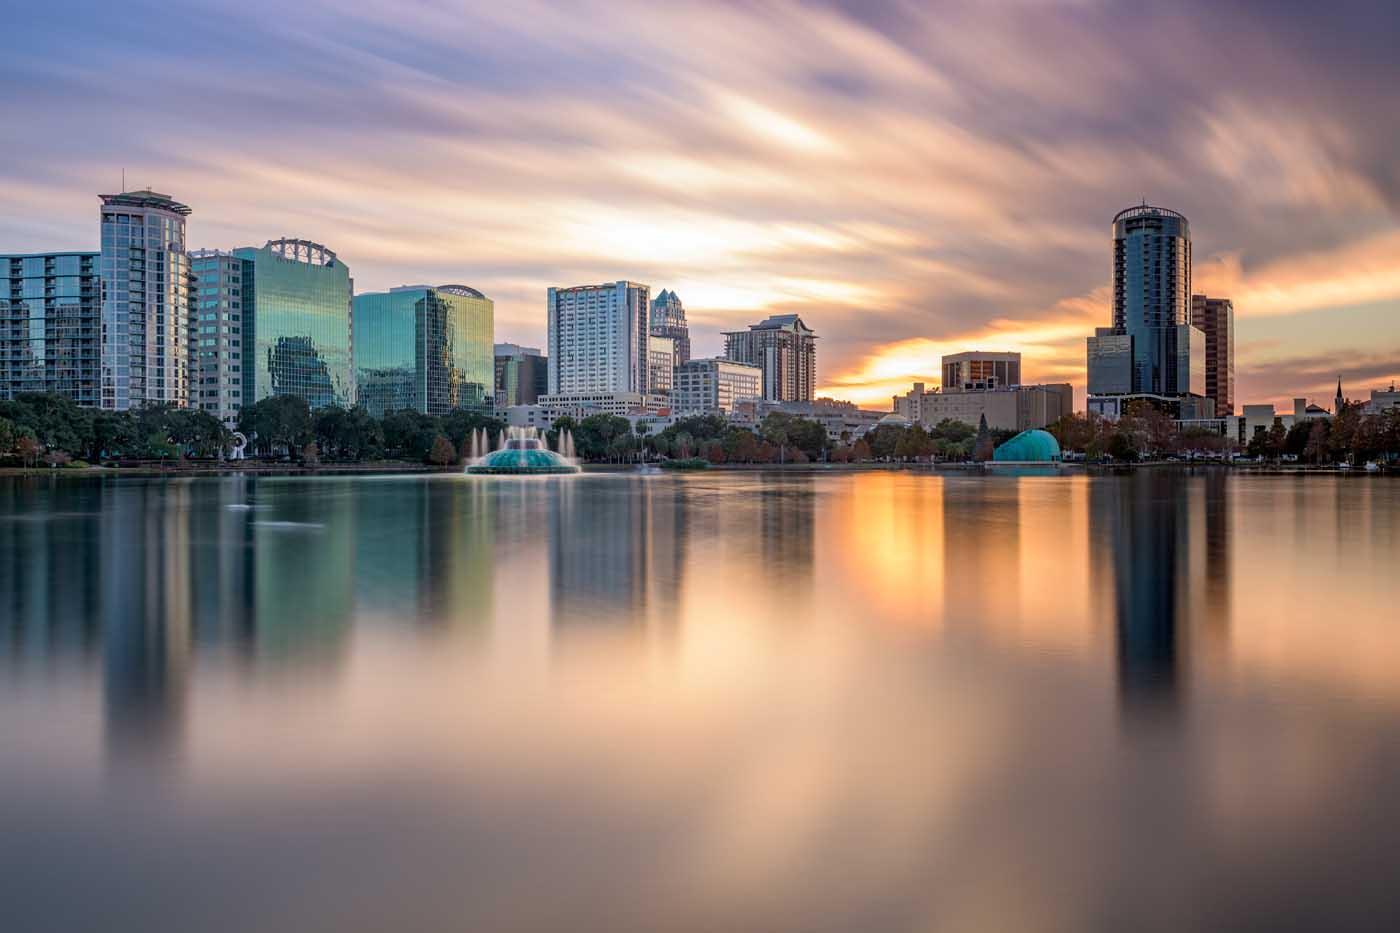 Orlando Travel Costs & Prices - Walt Disney World